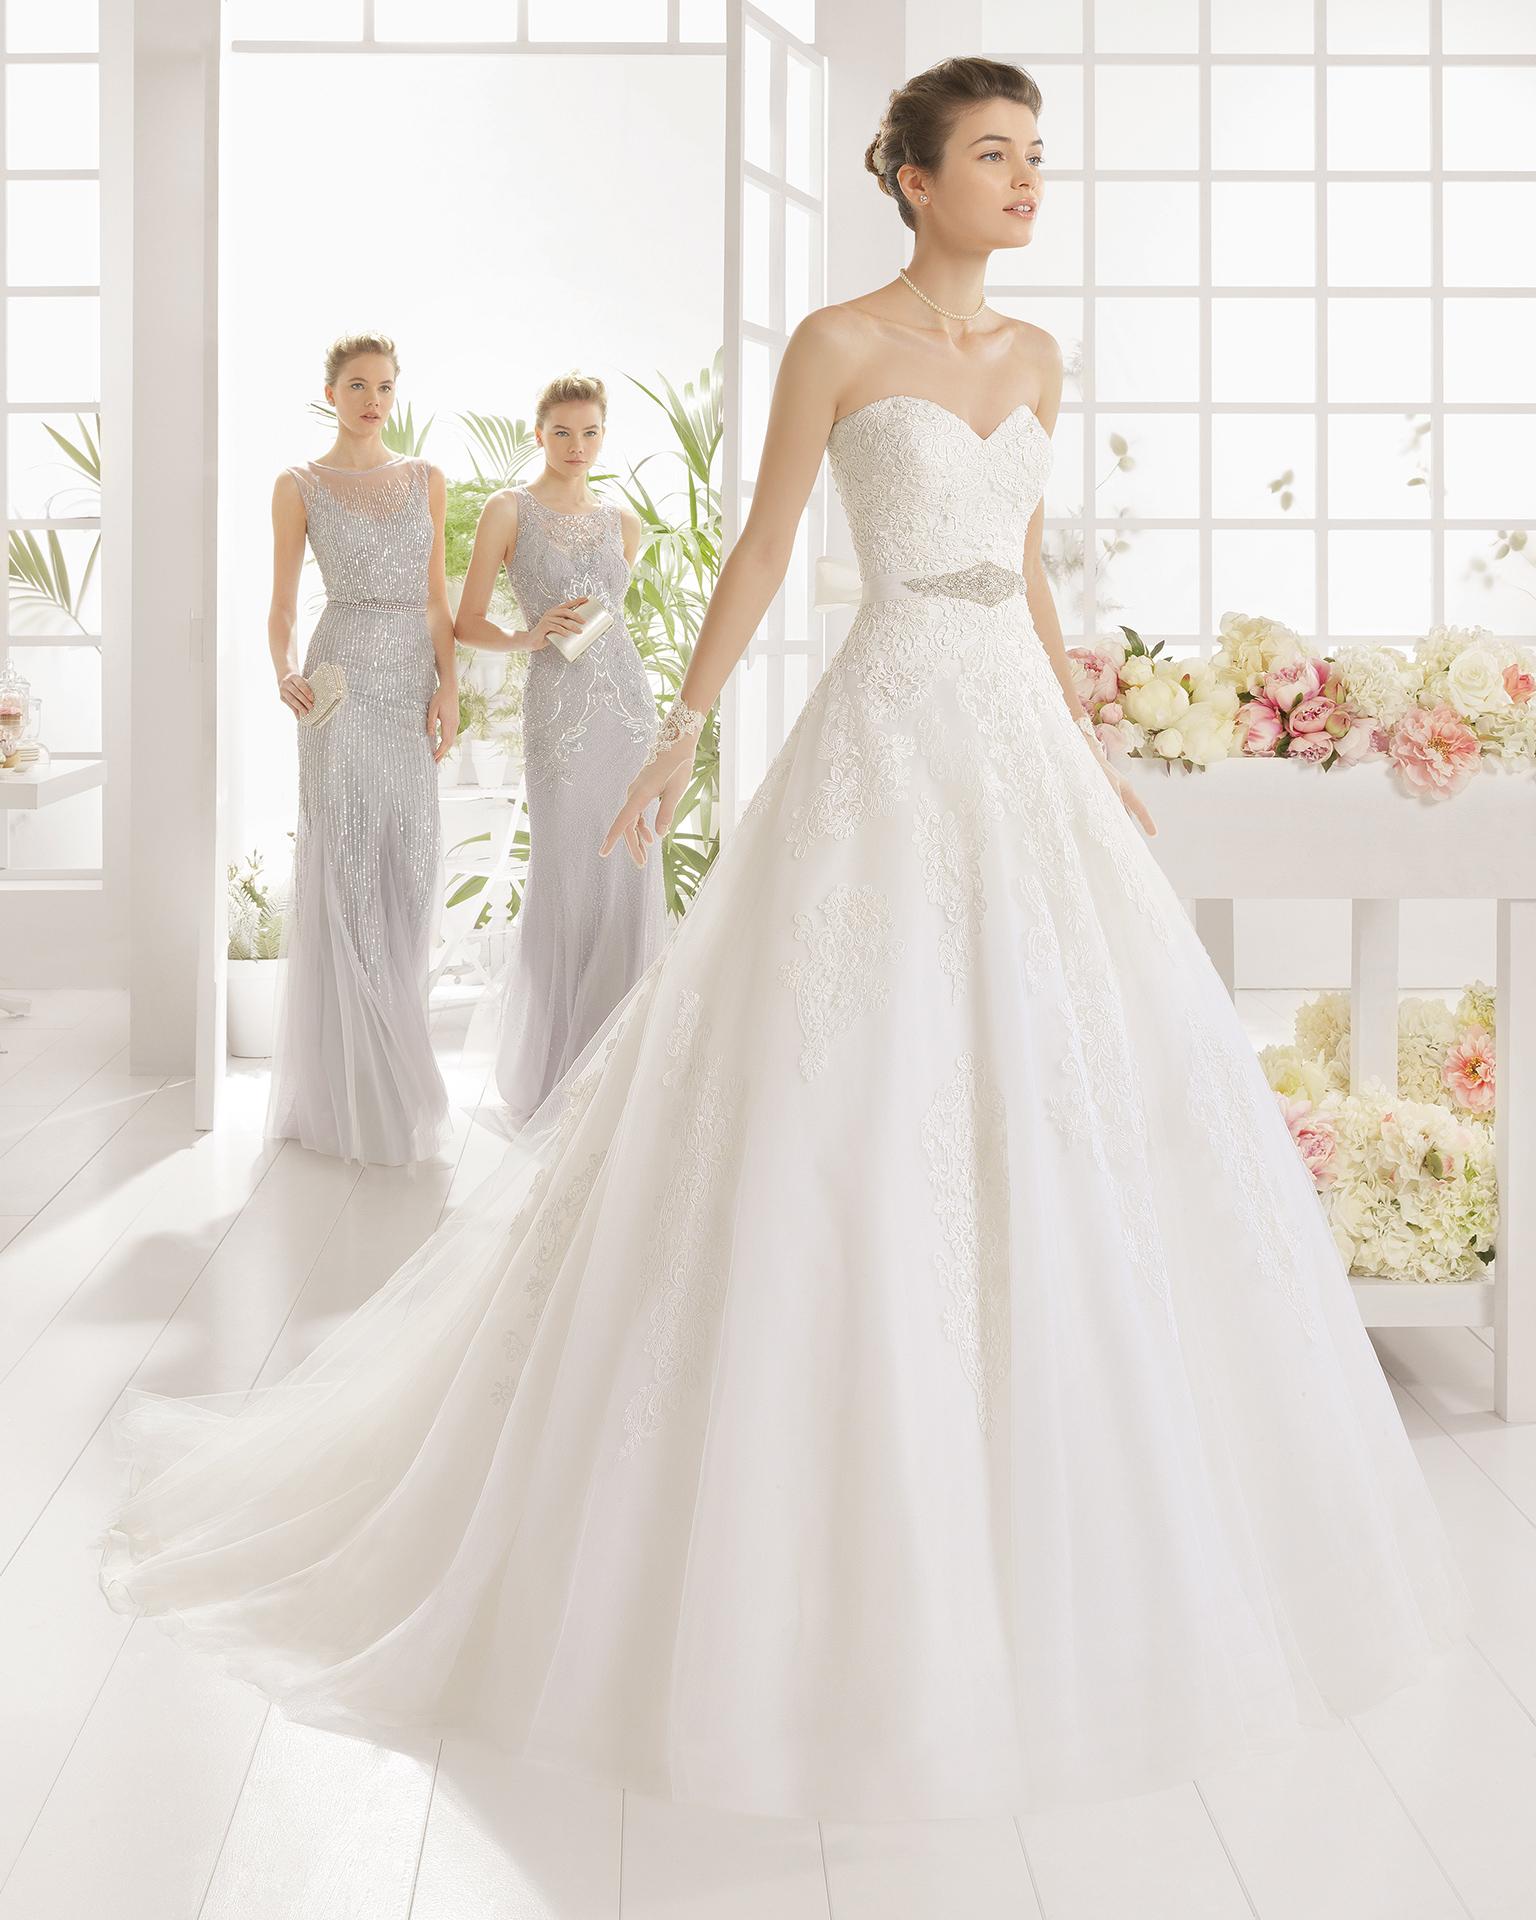 MIXTO wedding dress - Aire Barcelona 2016.